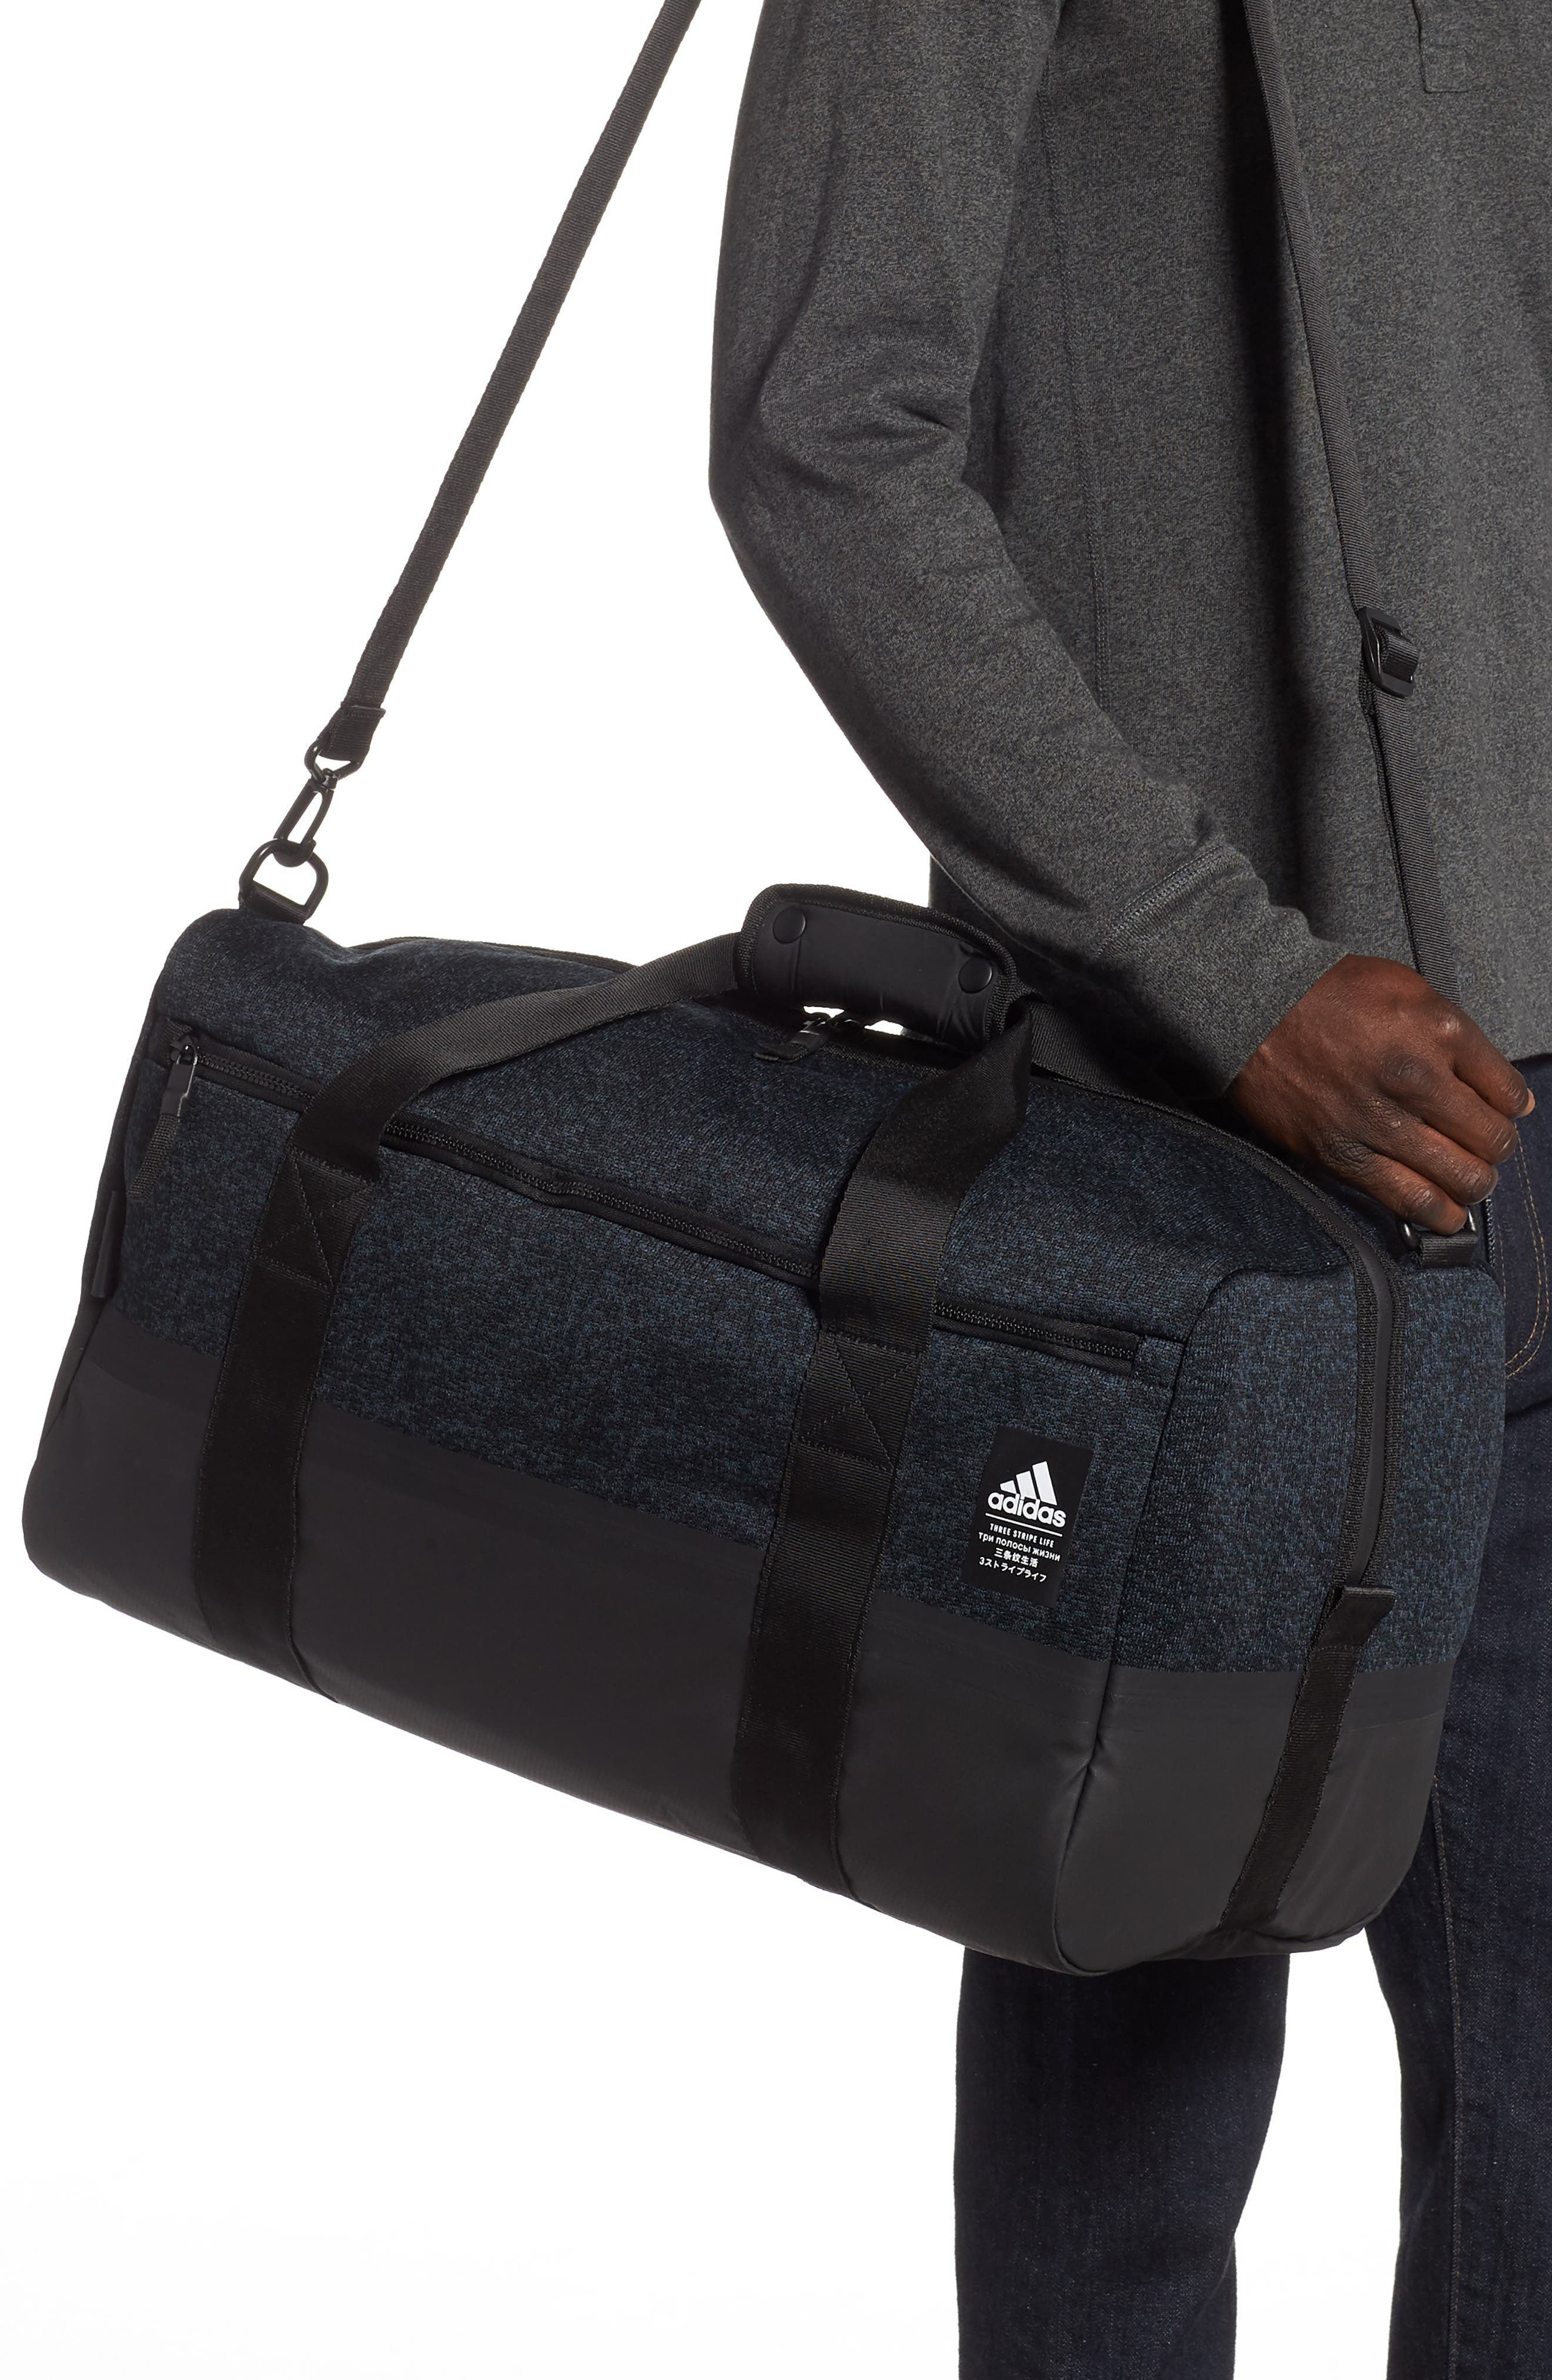 ADIDAS ORIGINALS, PK Amplifier Duffle Bag, Alternate thumbnail 2, color, GREY/ BLACK